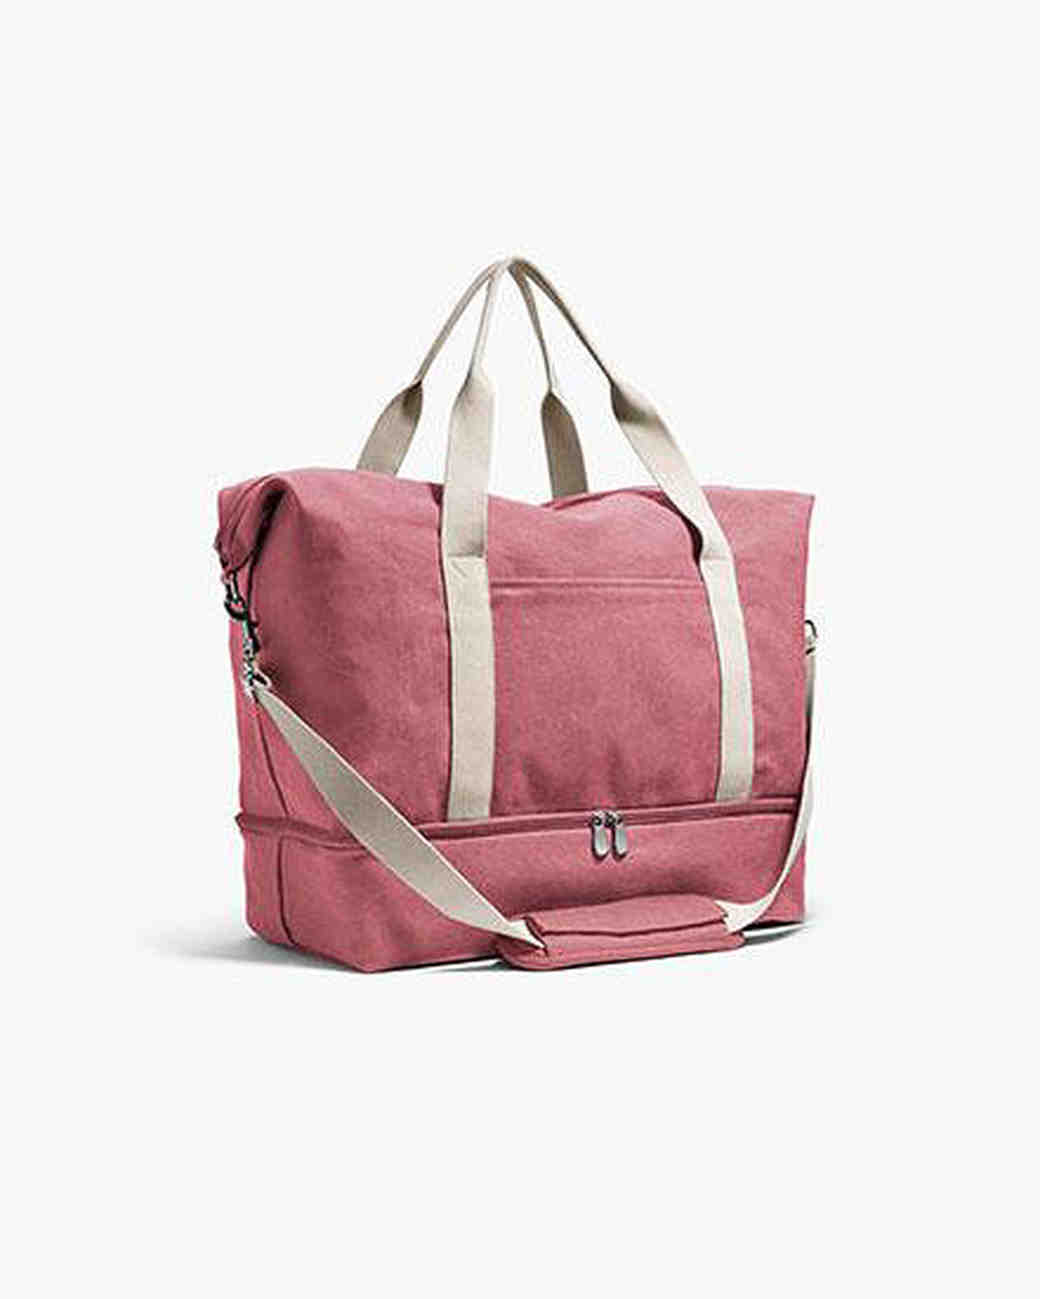 bridesmaid gift salmon pink weekender bag